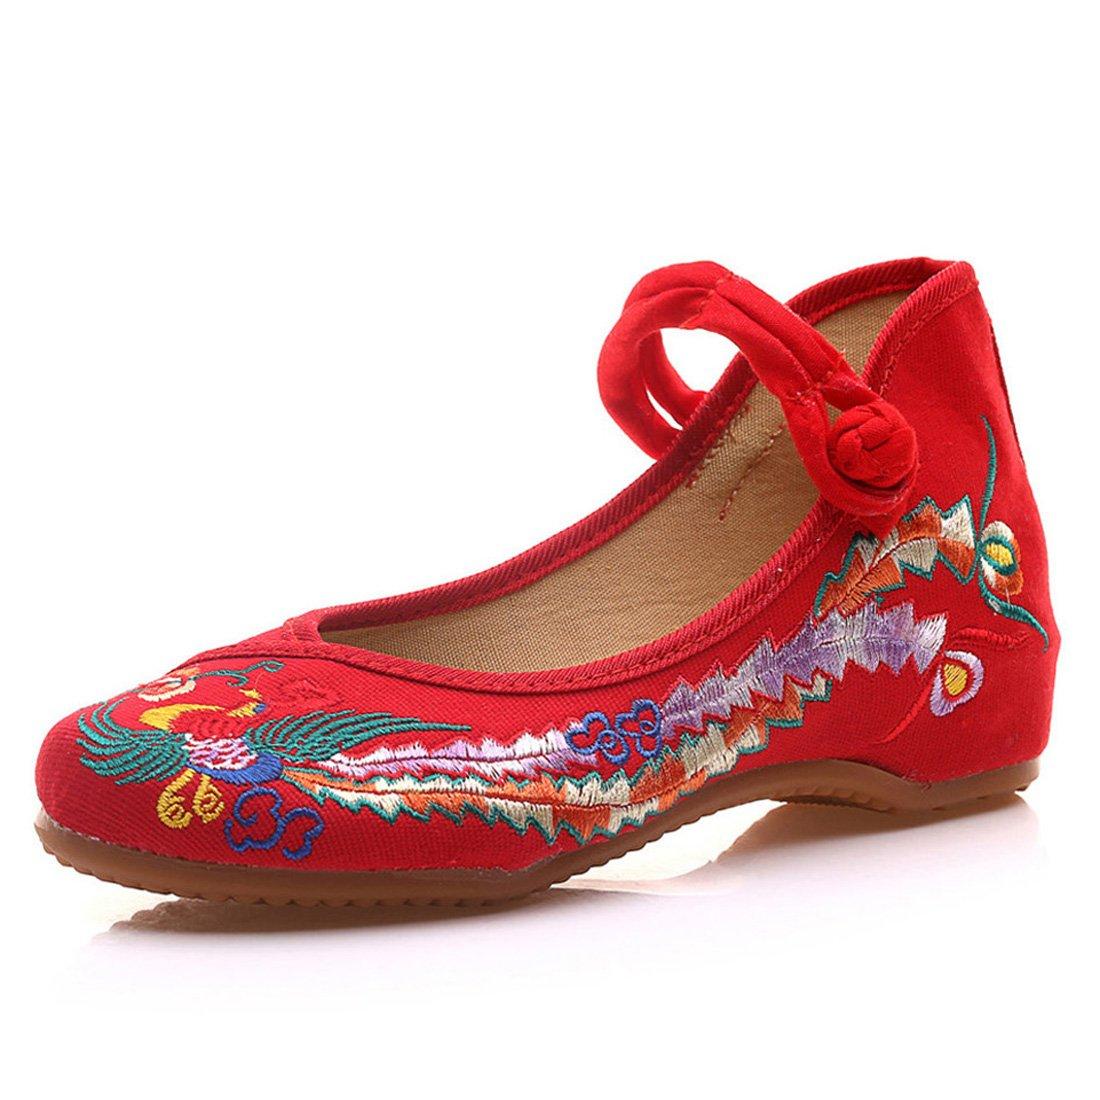 Fanwer Mary Jane Toile Phoenix Brodé Femmes Doux Semelle Chaussures Chinoises Appartements Flats